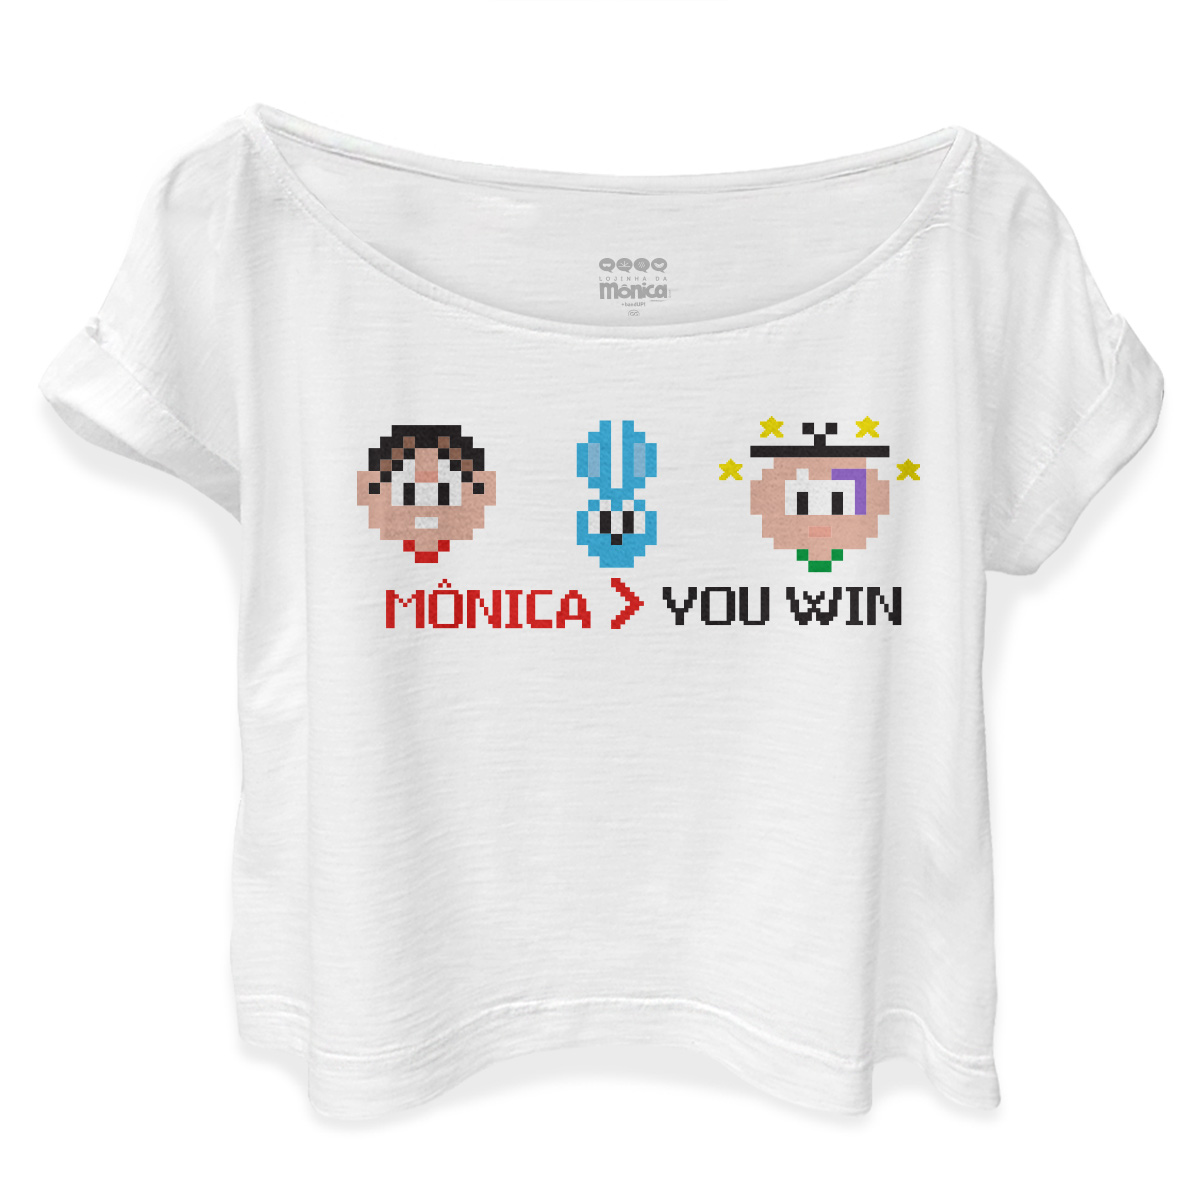 T-shirt Premium Feminina Turma da Mônica You Win